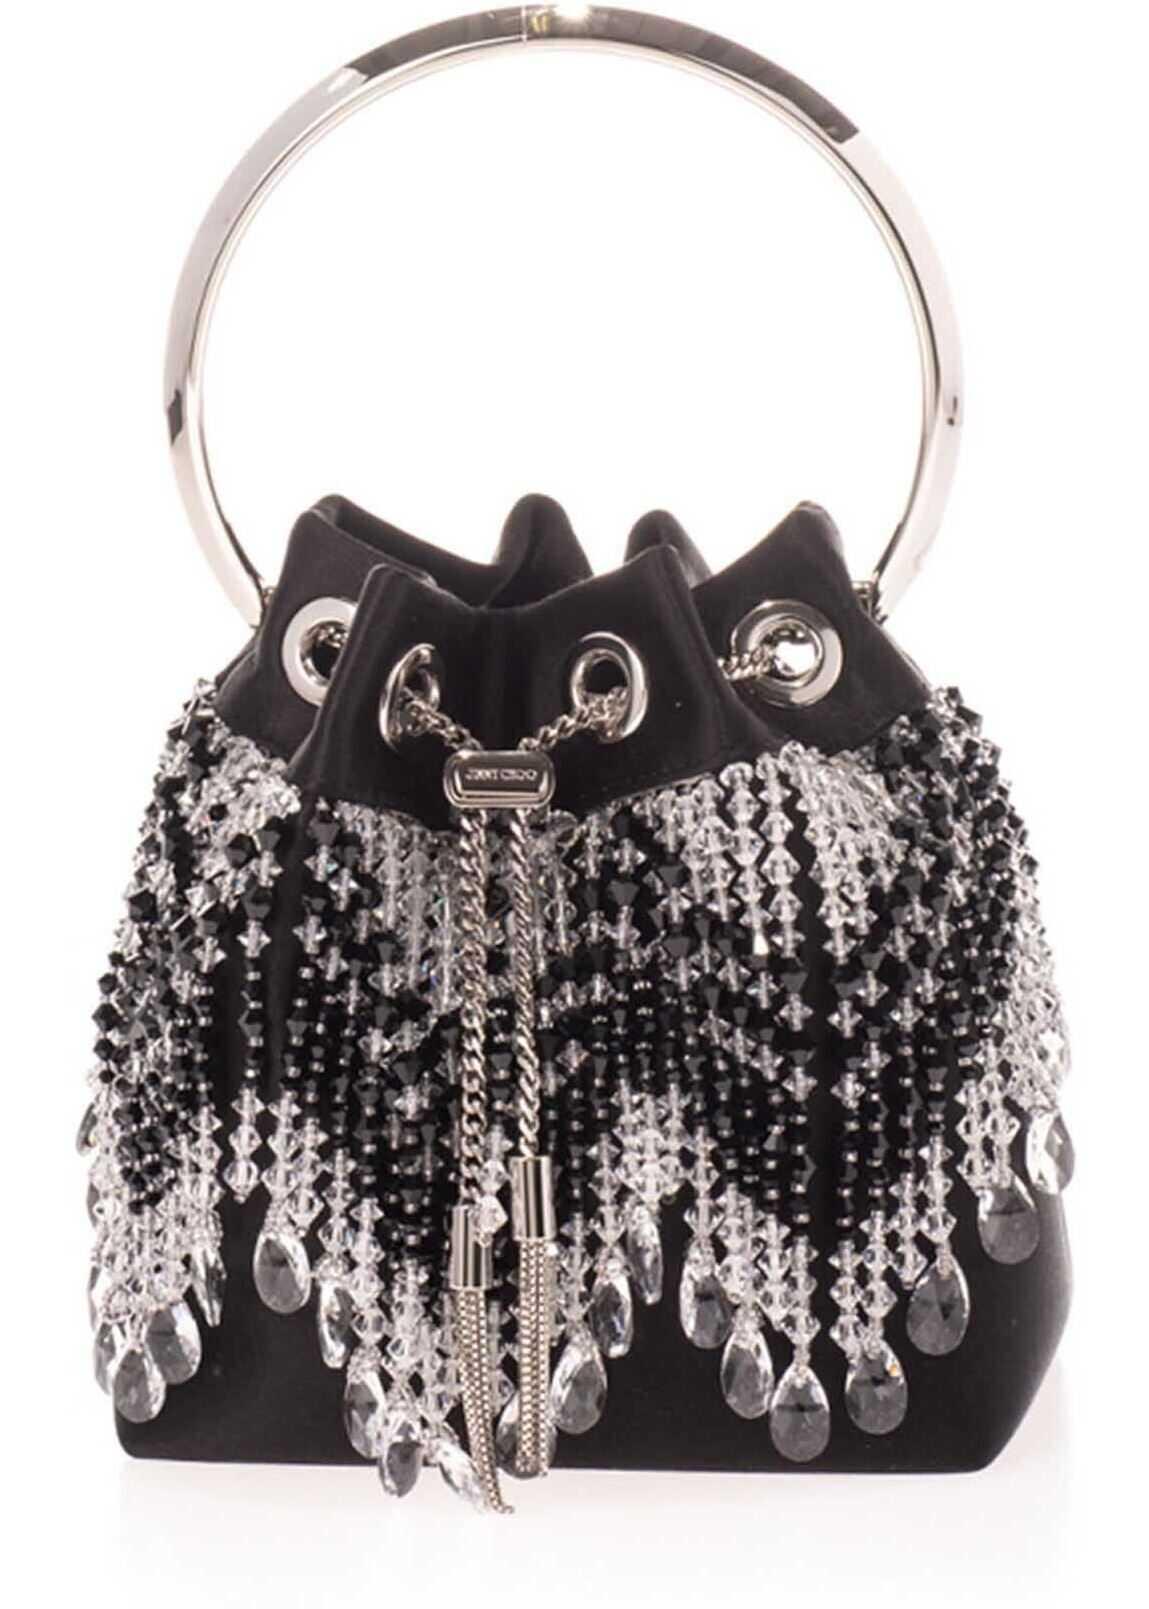 Jimmy Choo Bon Bon Crystal Tote Bag In Black BON BON AOI BLACK/CRYSTAL Black imagine b-mall.ro